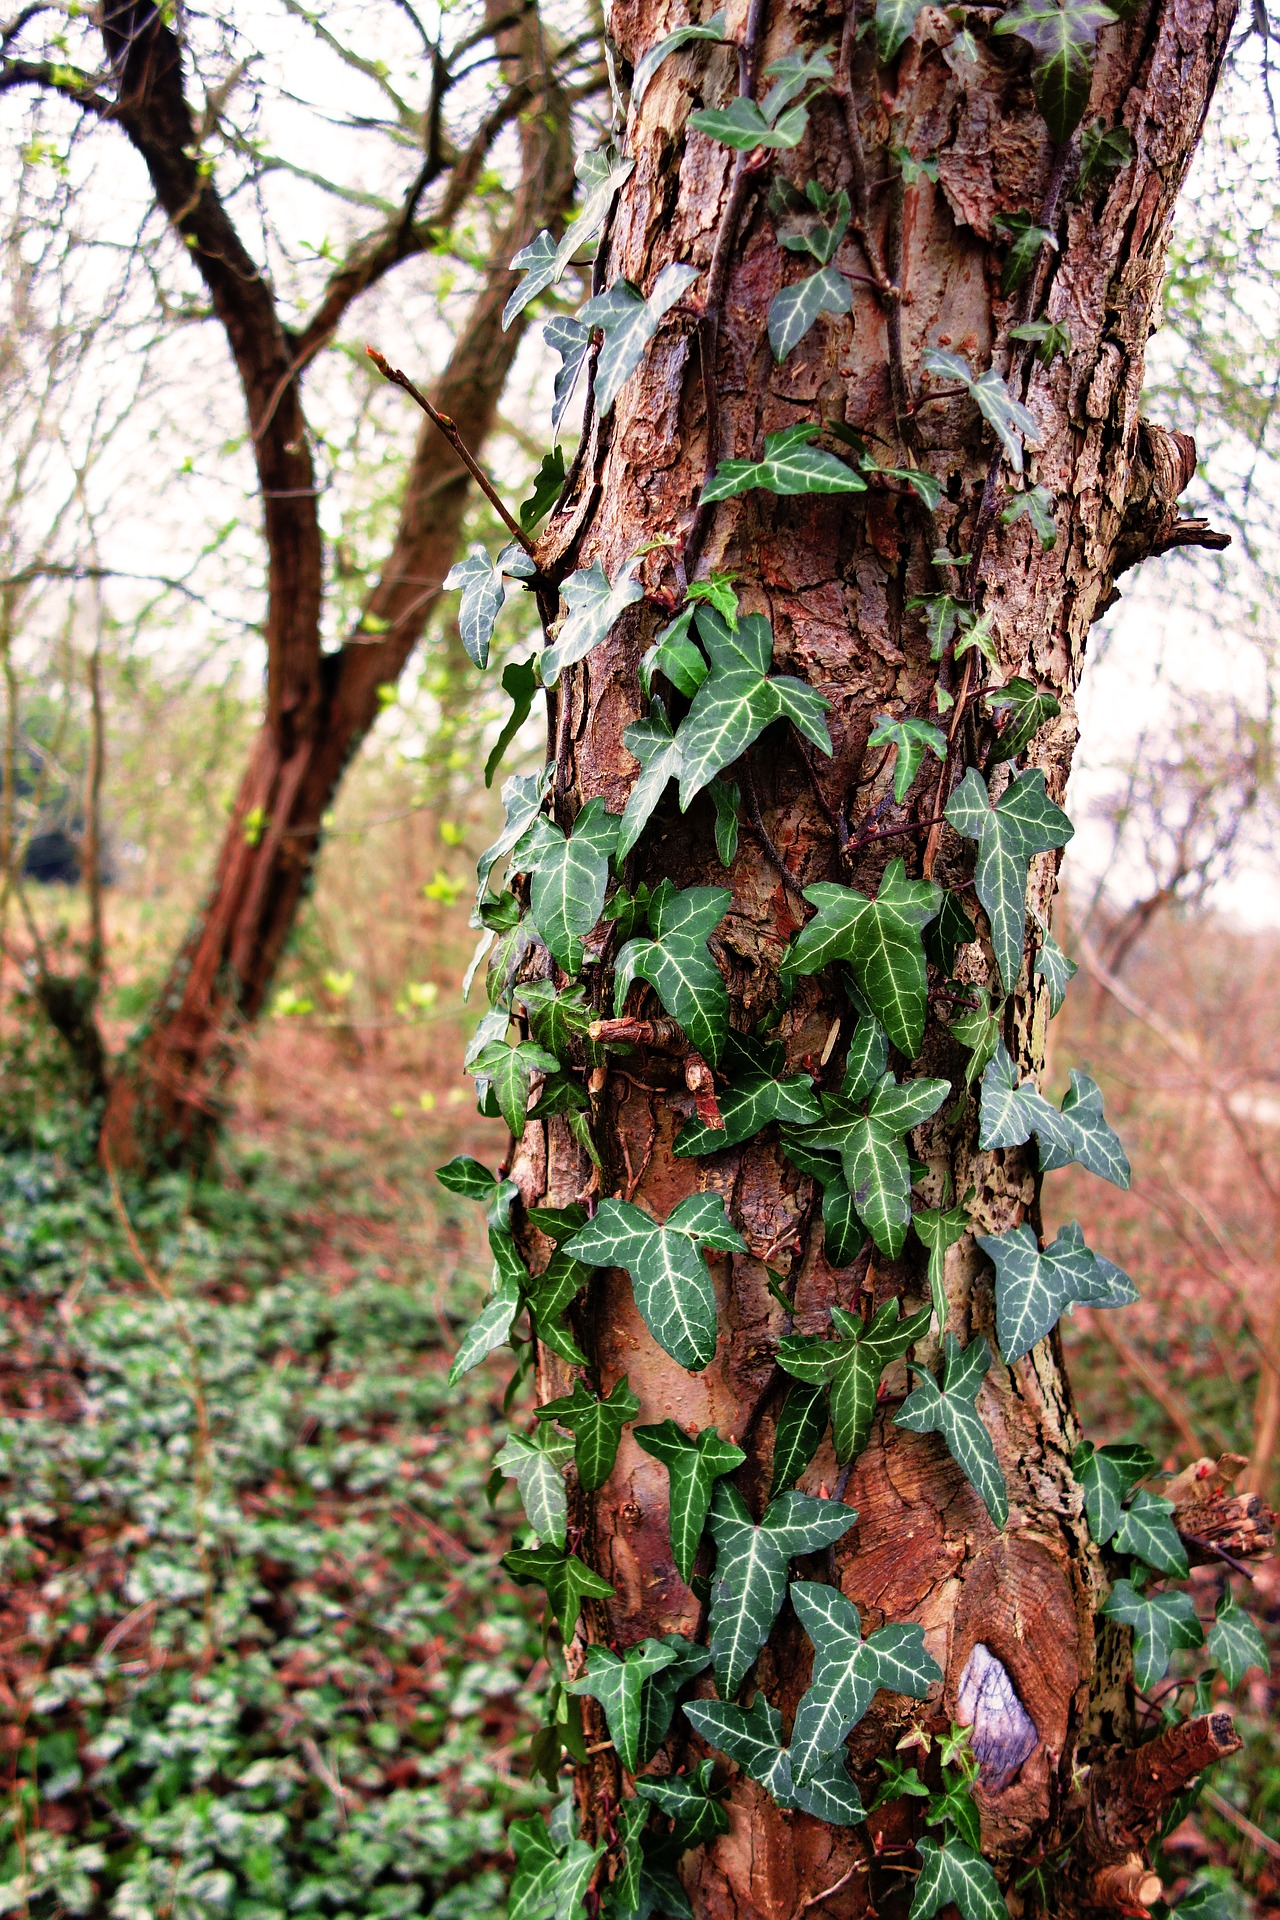 tree-trunk-3281959_1920